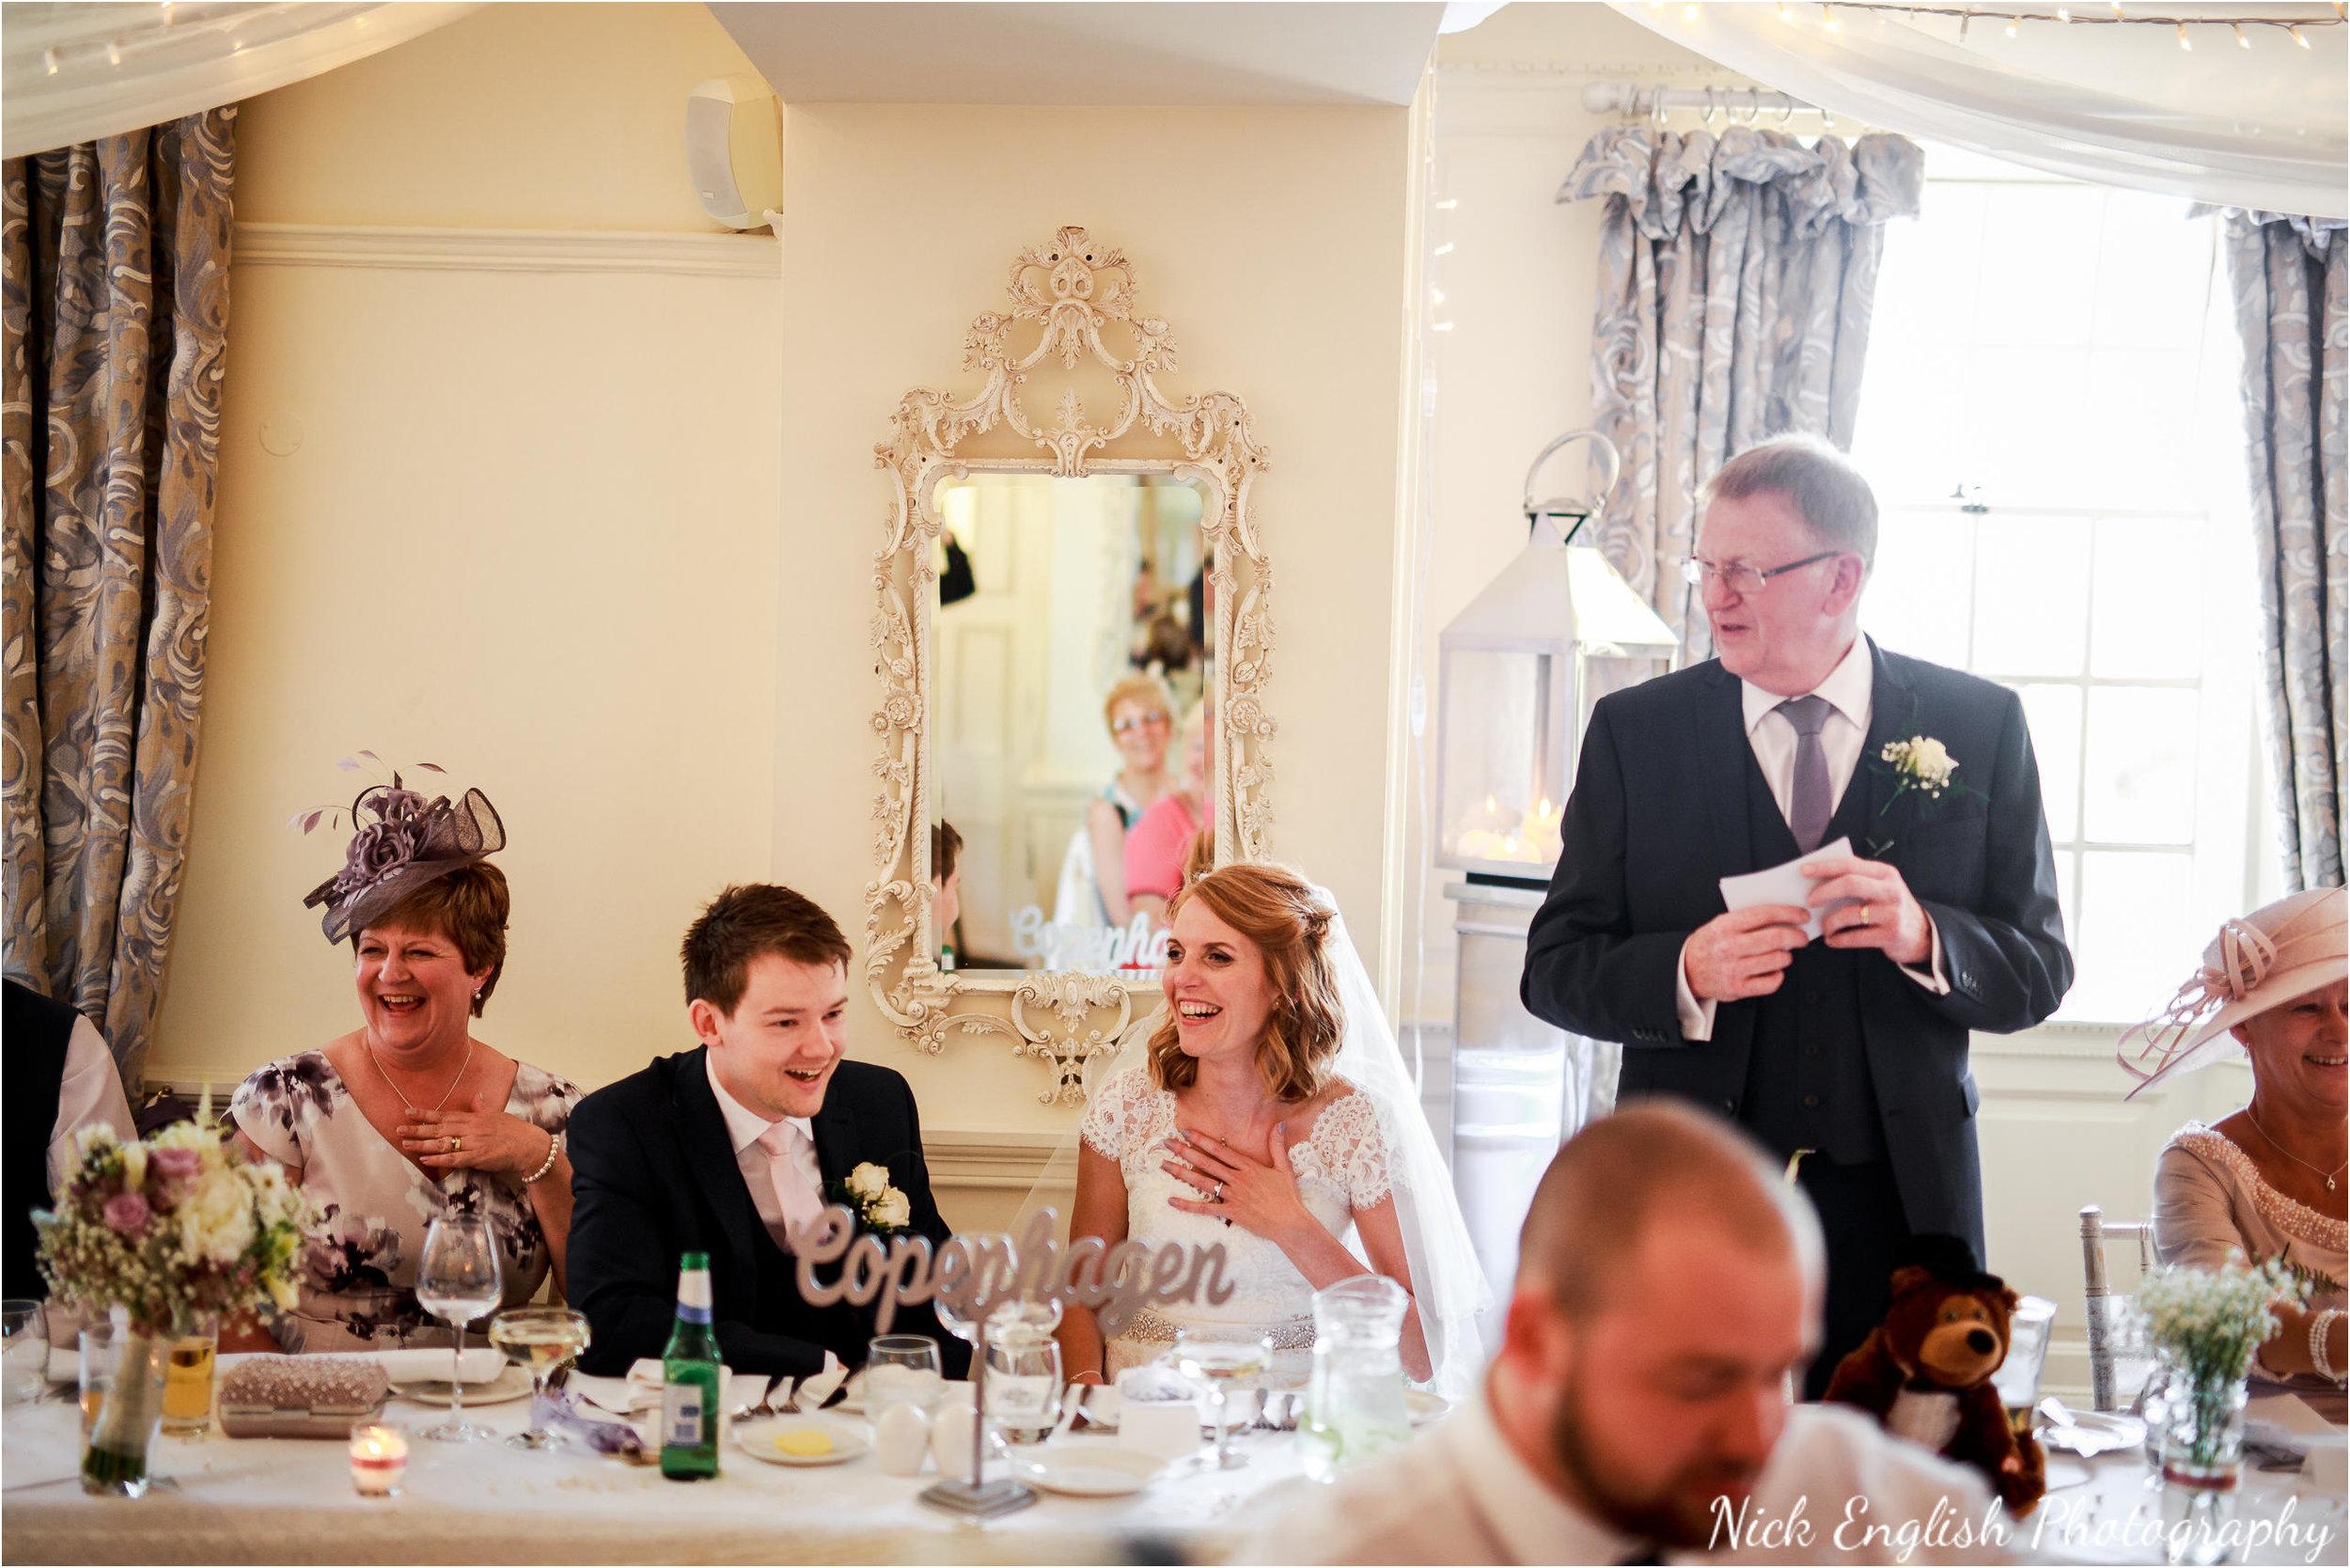 Alison James Wedding Photographs at Eaves Hall West Bradford 169jpg.jpeg